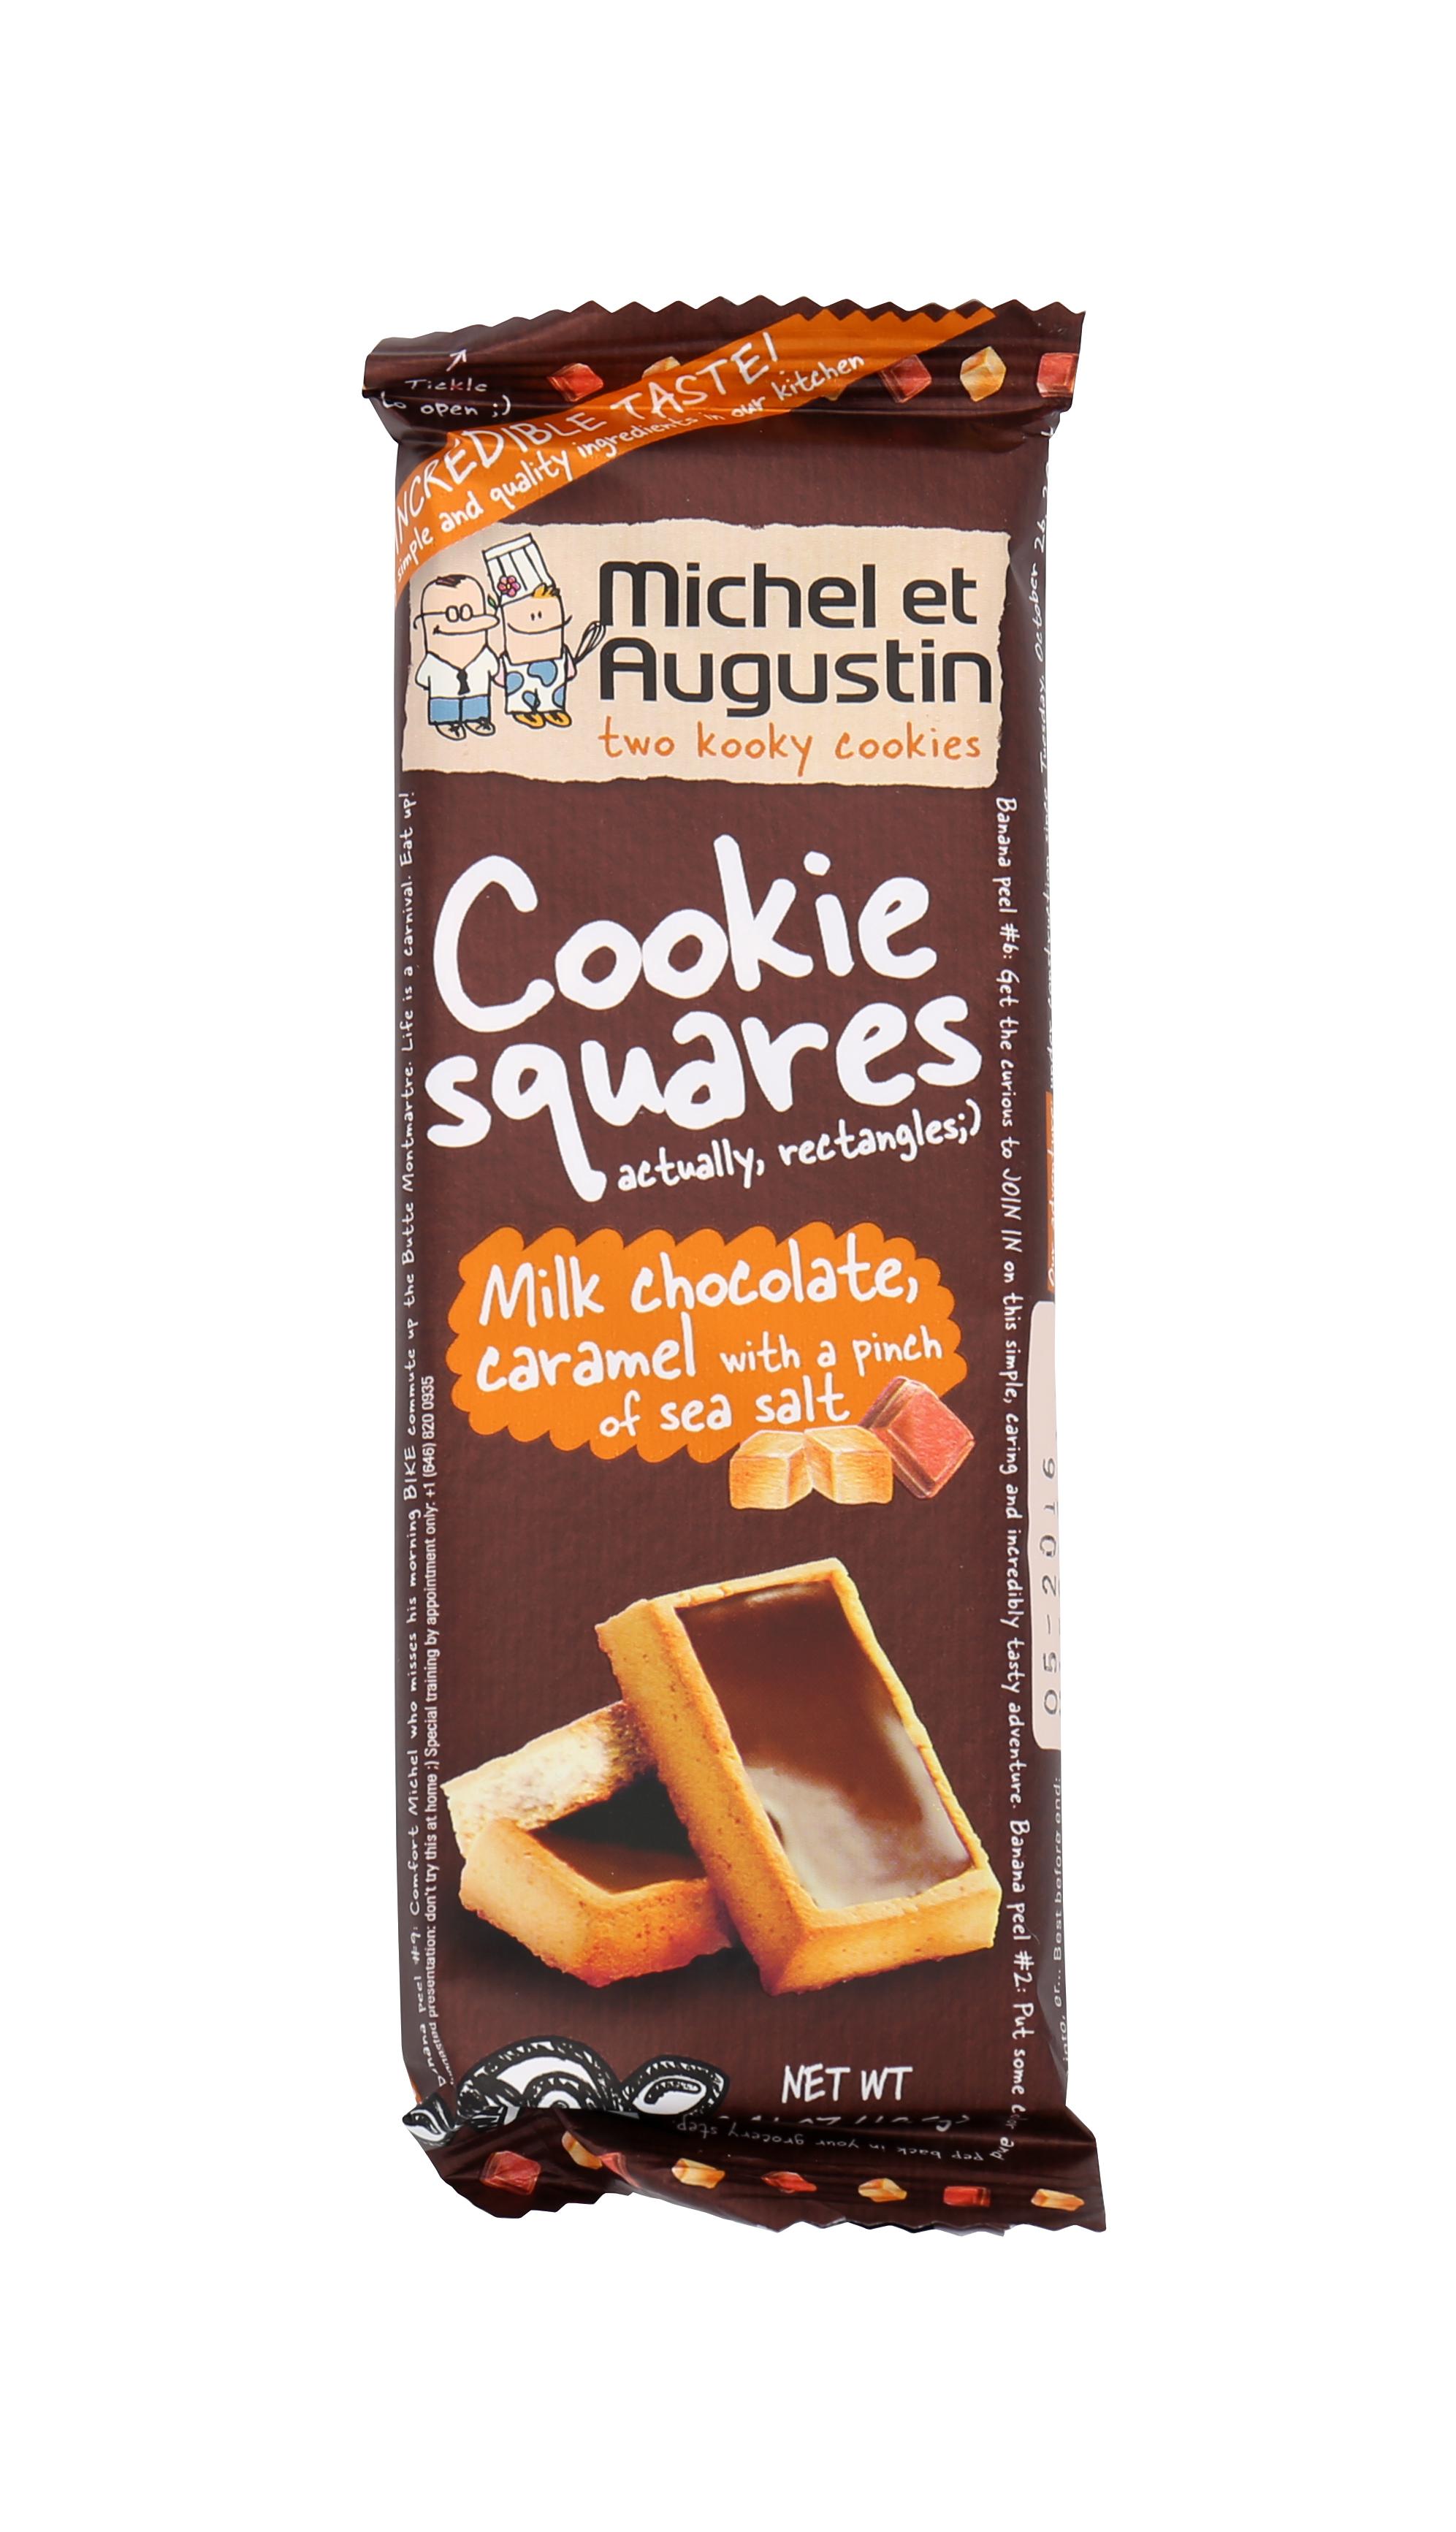 Milk Chocolate, Caramel with A Pinch of Salt